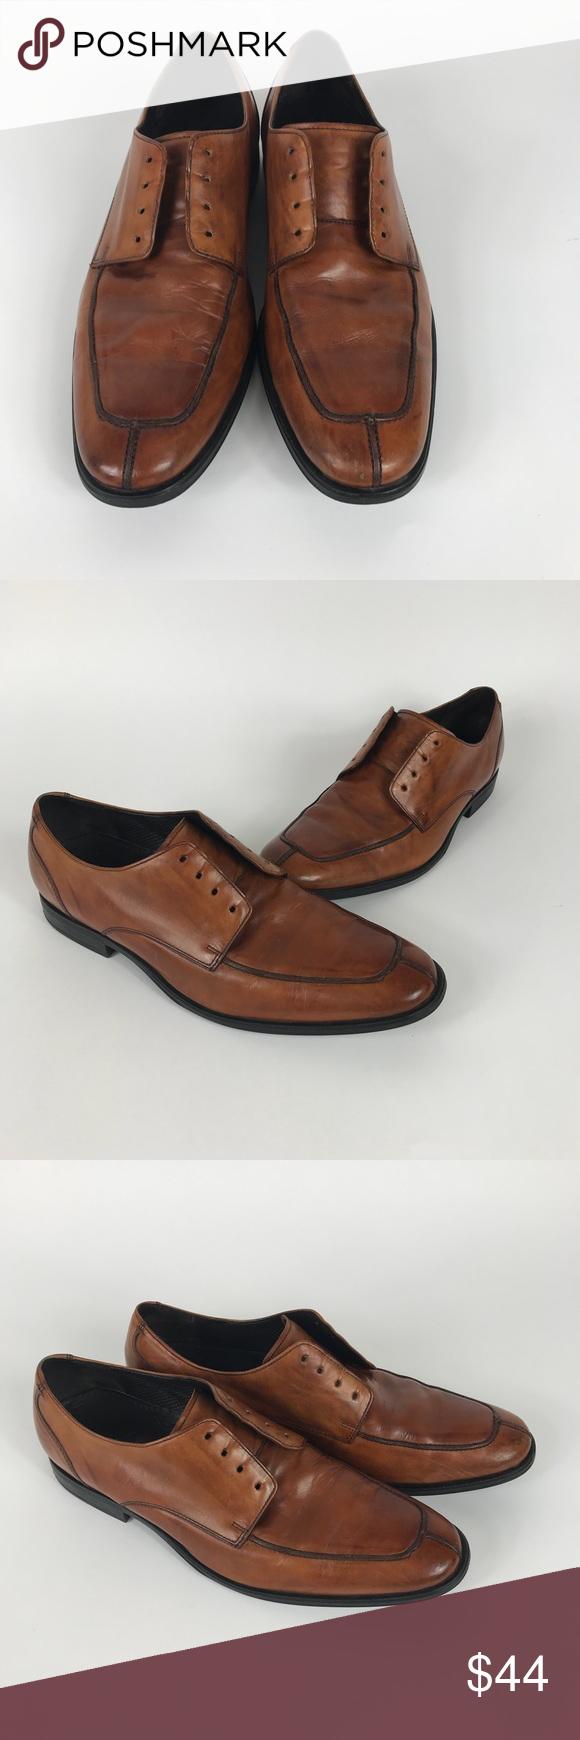 Cole Haan NikeAir Brown Oxford Dress Shoes Sz 10M